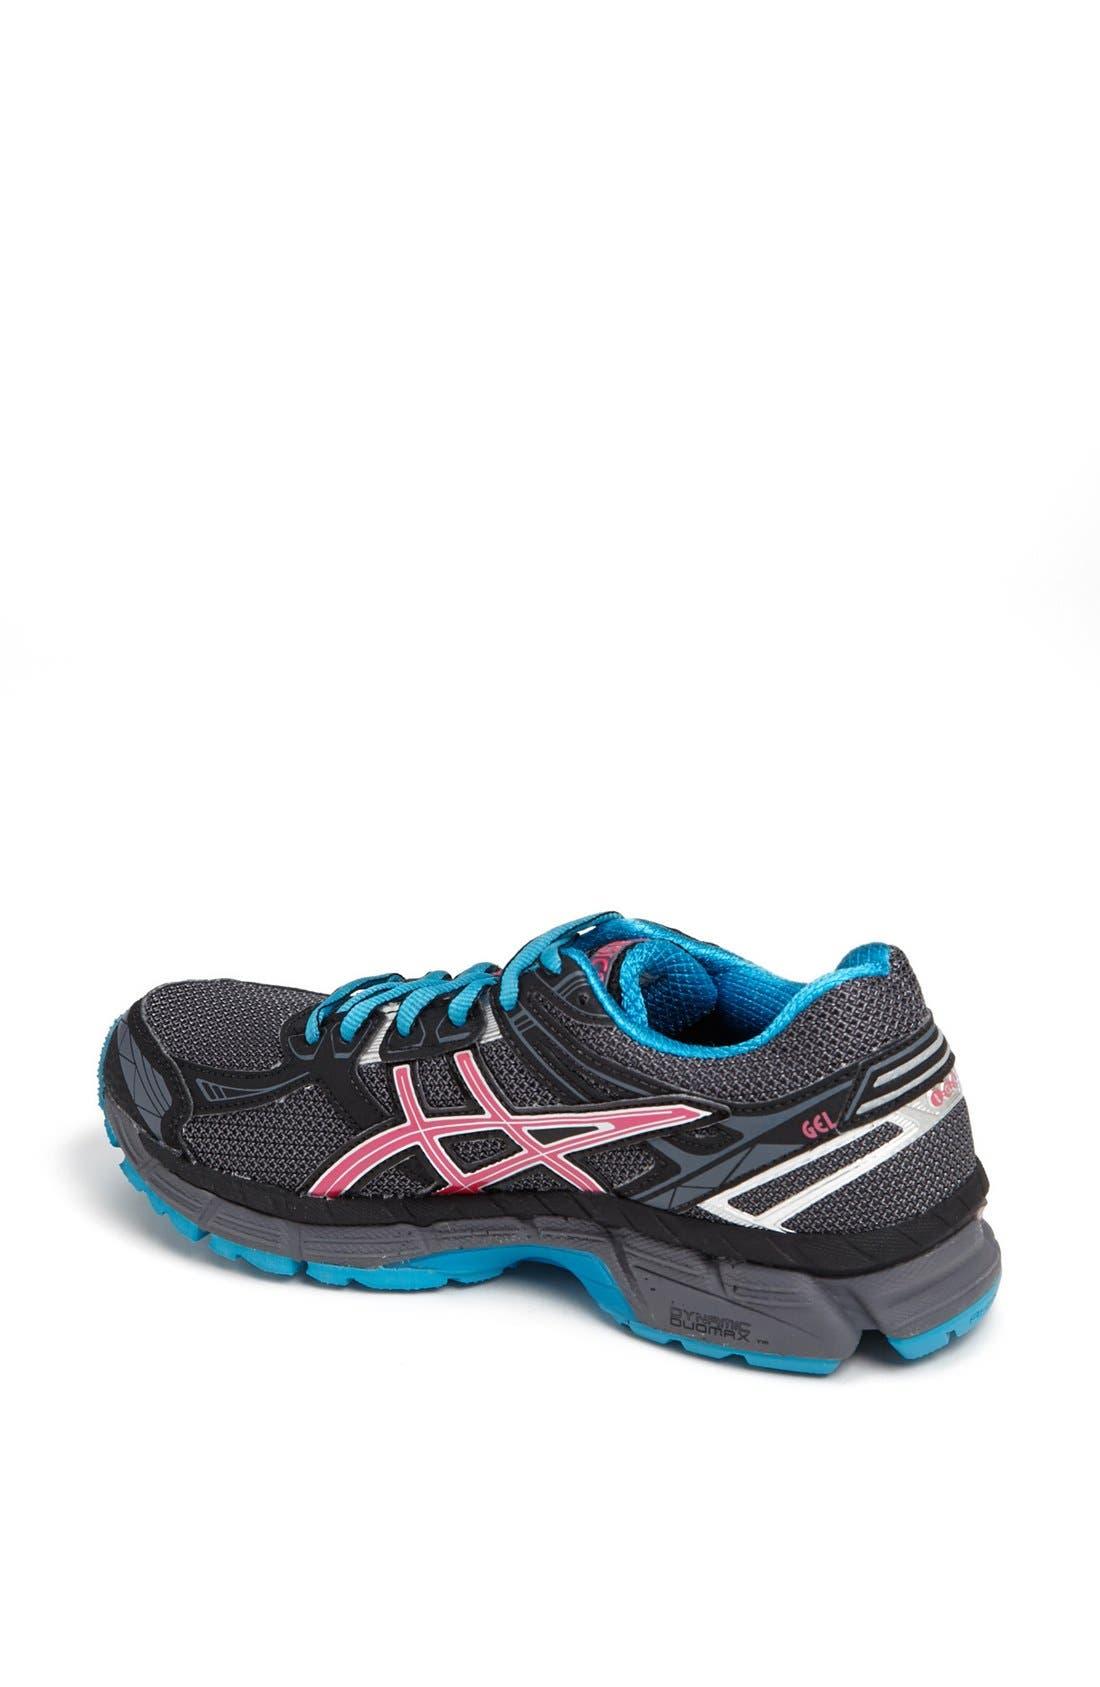 Alternate Image 2  - ASICS® 'GT-2000™ G-TX' Waterproof Running Shoe (Women)